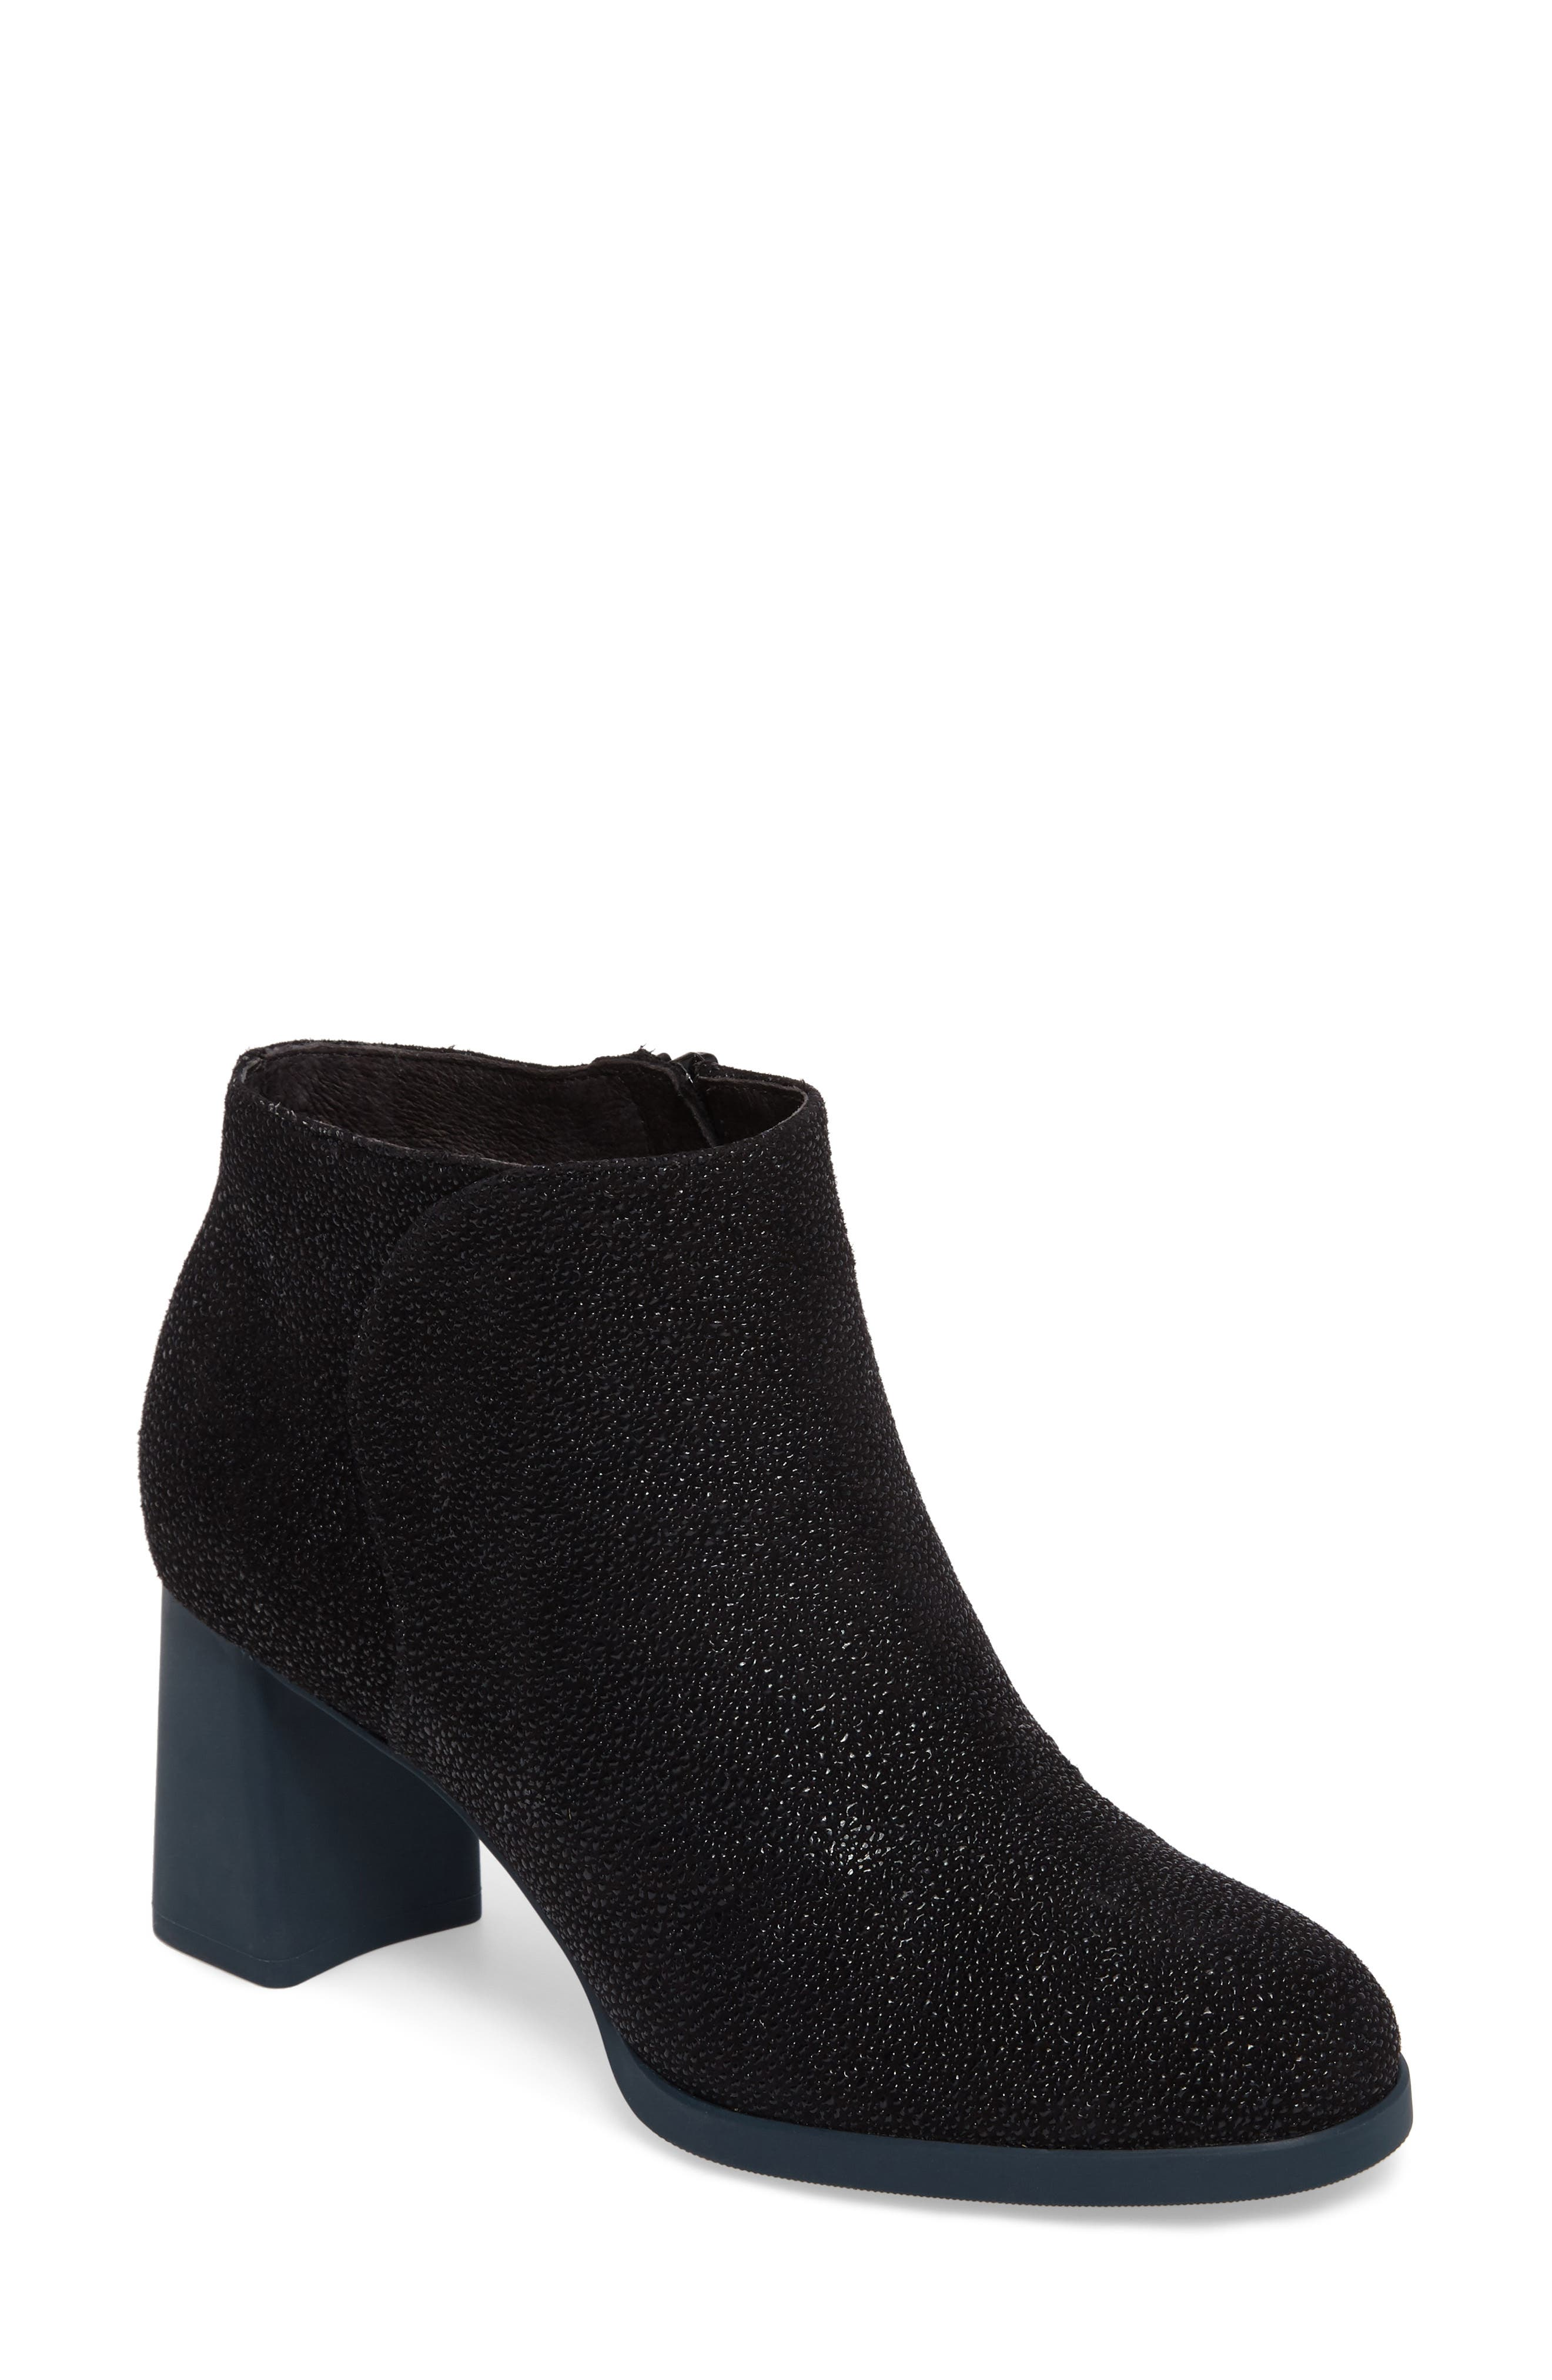 Kara Flared Heel Bootie,                         Main,                         color, Black Sparkle Leather